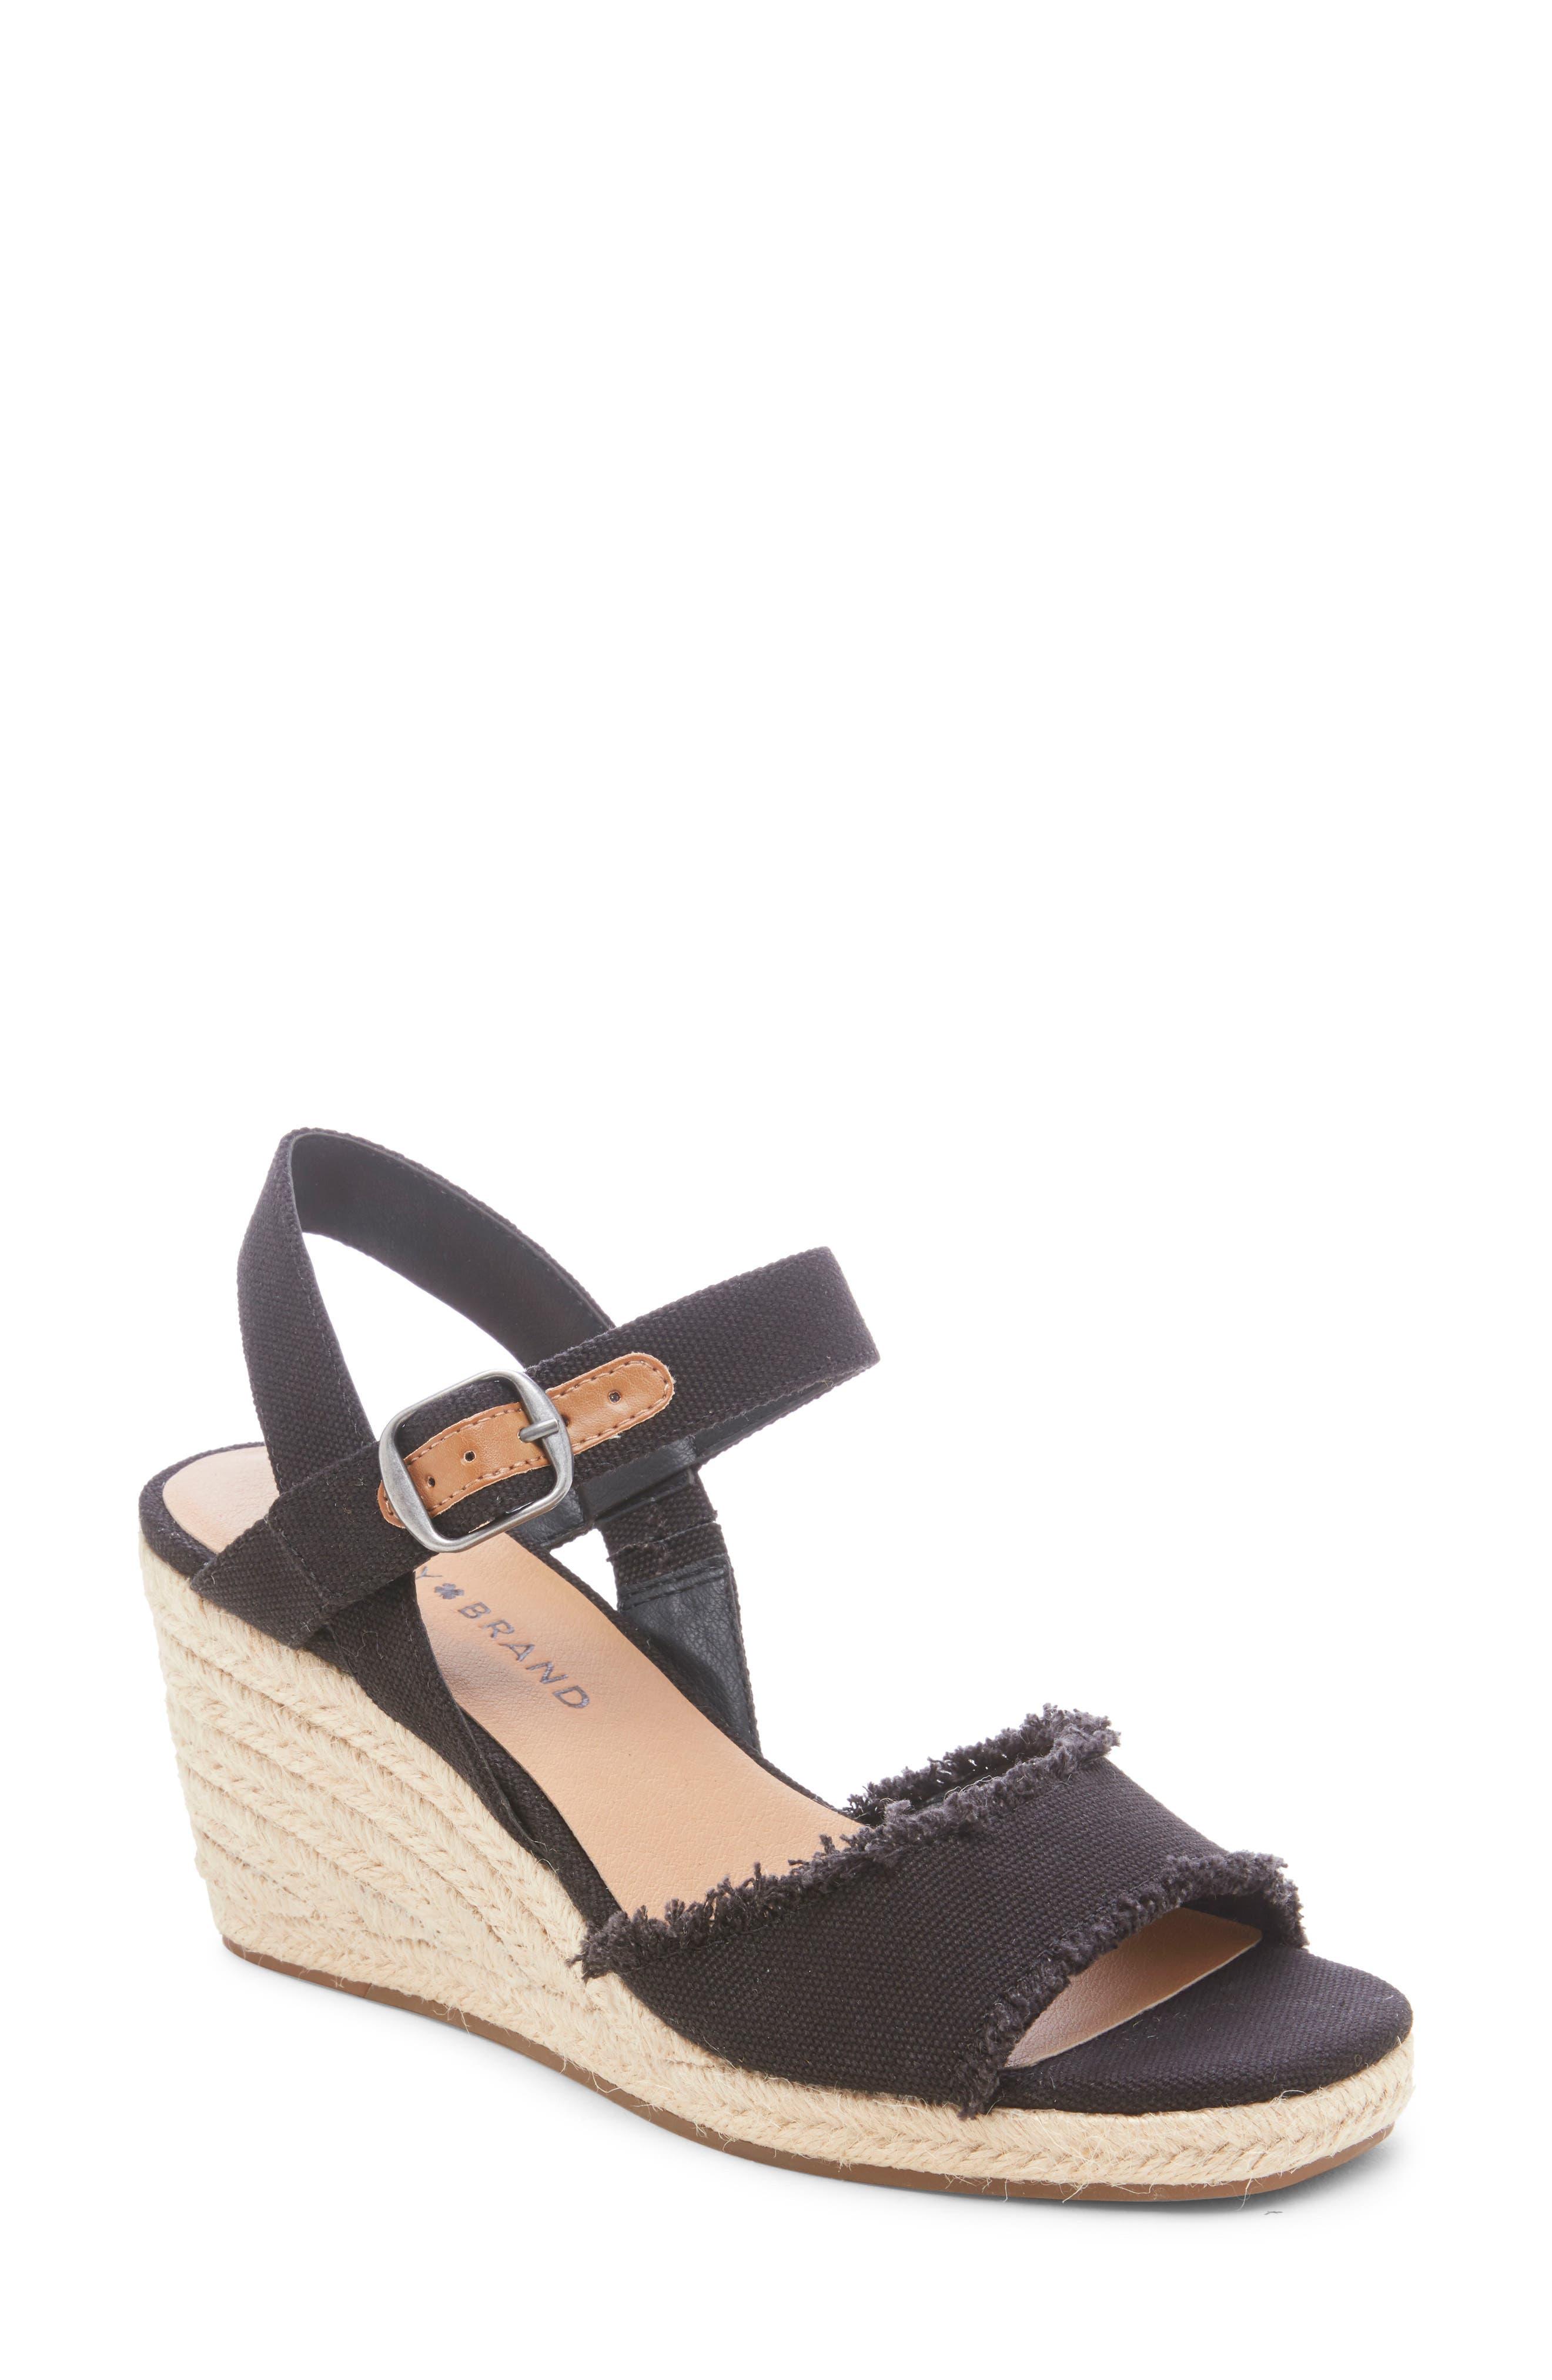 LUCKY BRAND Mindra Espadrille Wedge Sandal, Main, color, BLACK FABRIC